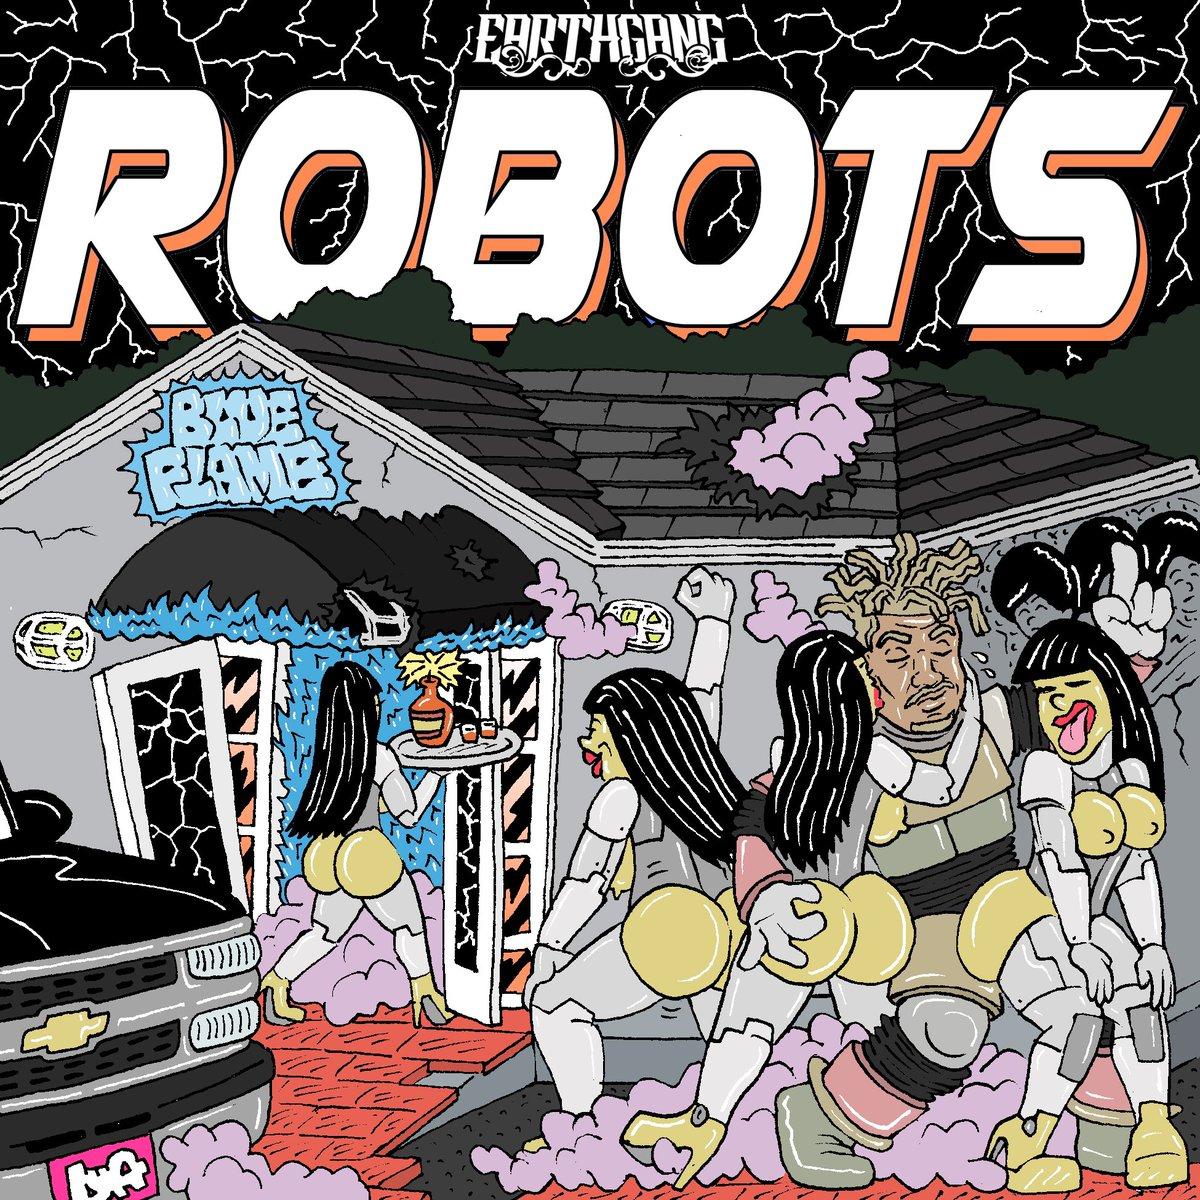 earthgang robots